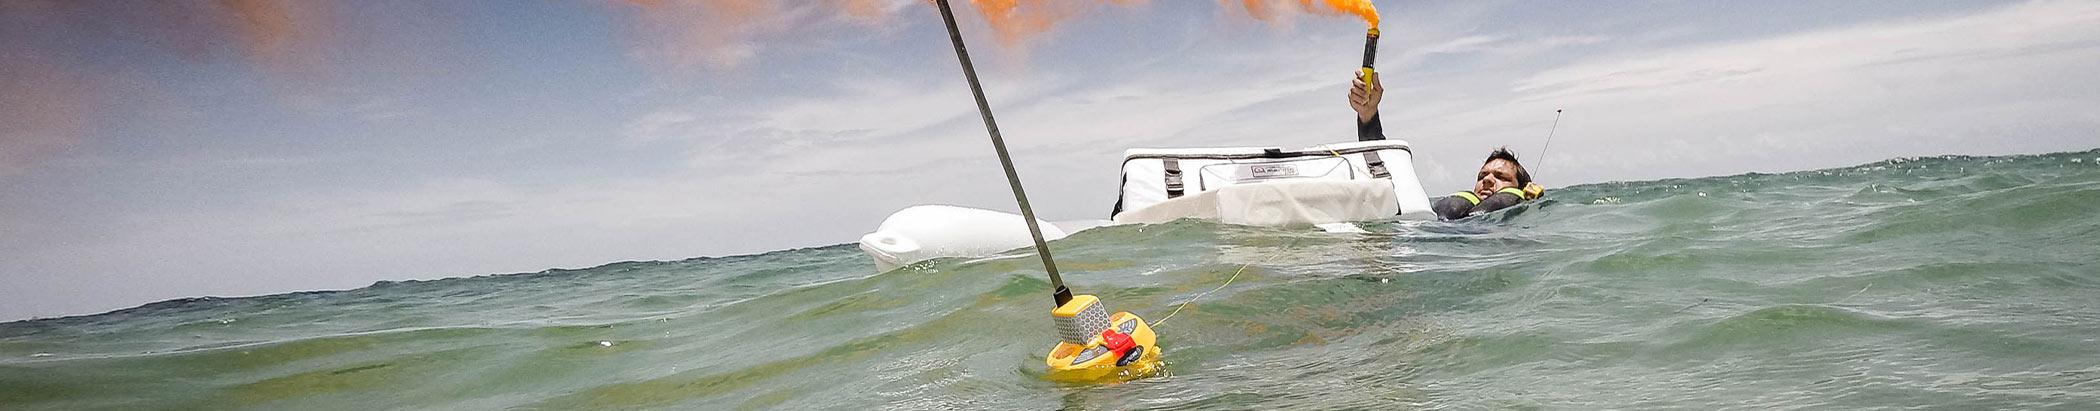 ocean signal-mood